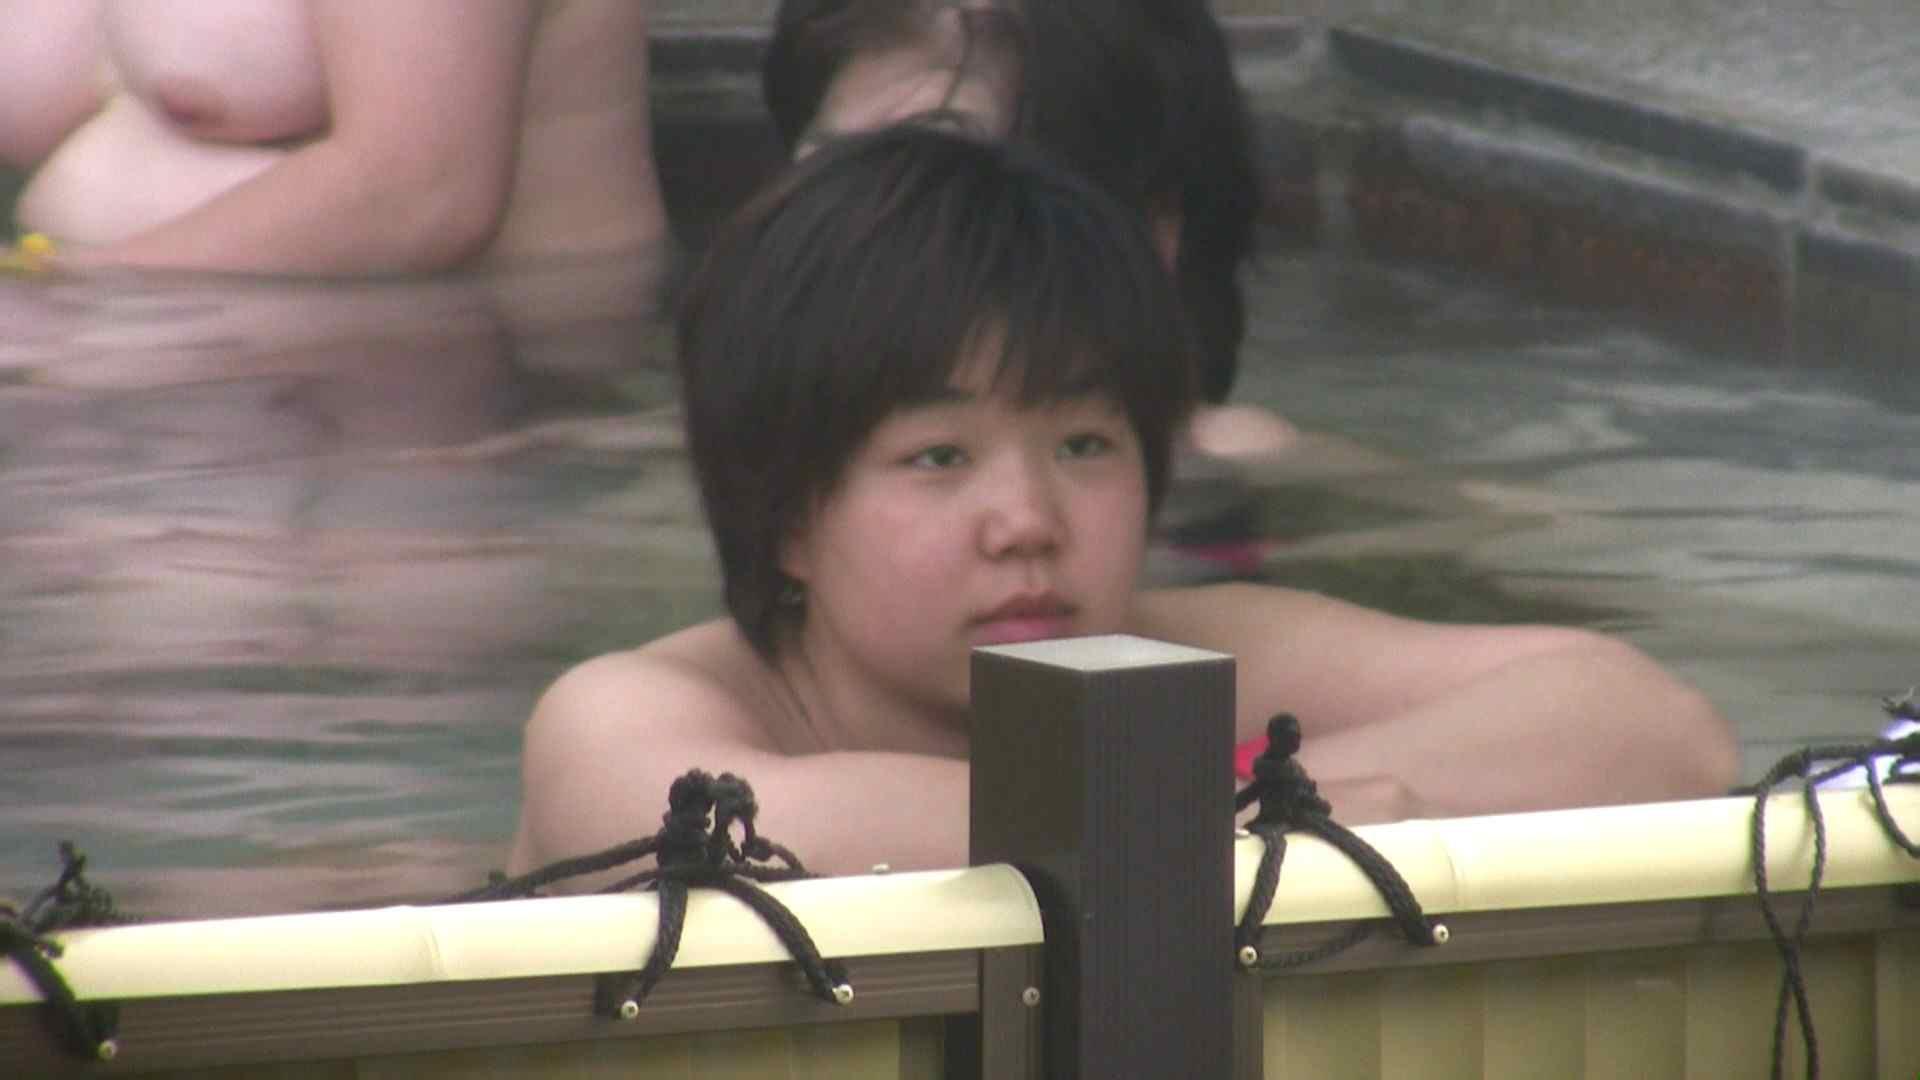 Aquaな露天風呂Vol.53【VIP限定】 女体盗撮  93連発 45